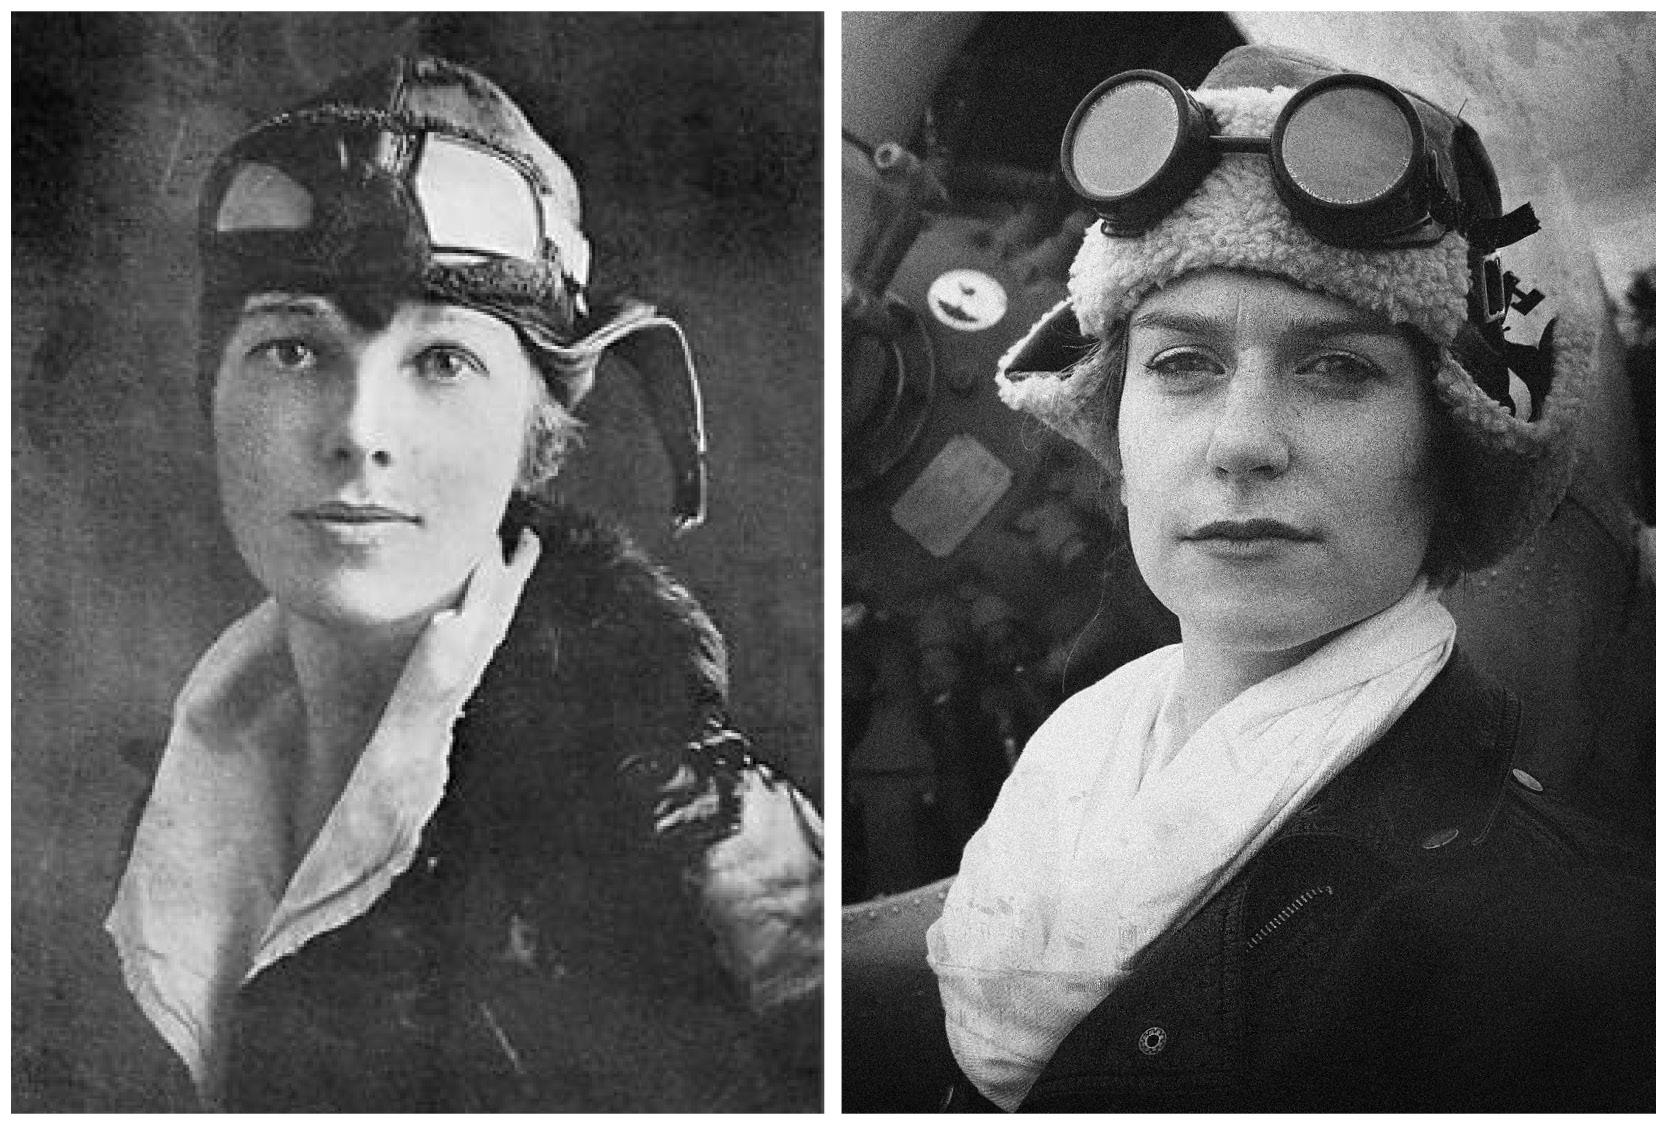 Photo comparison of original Amelia Earhart photo and Amelia Earhart Halloween costume